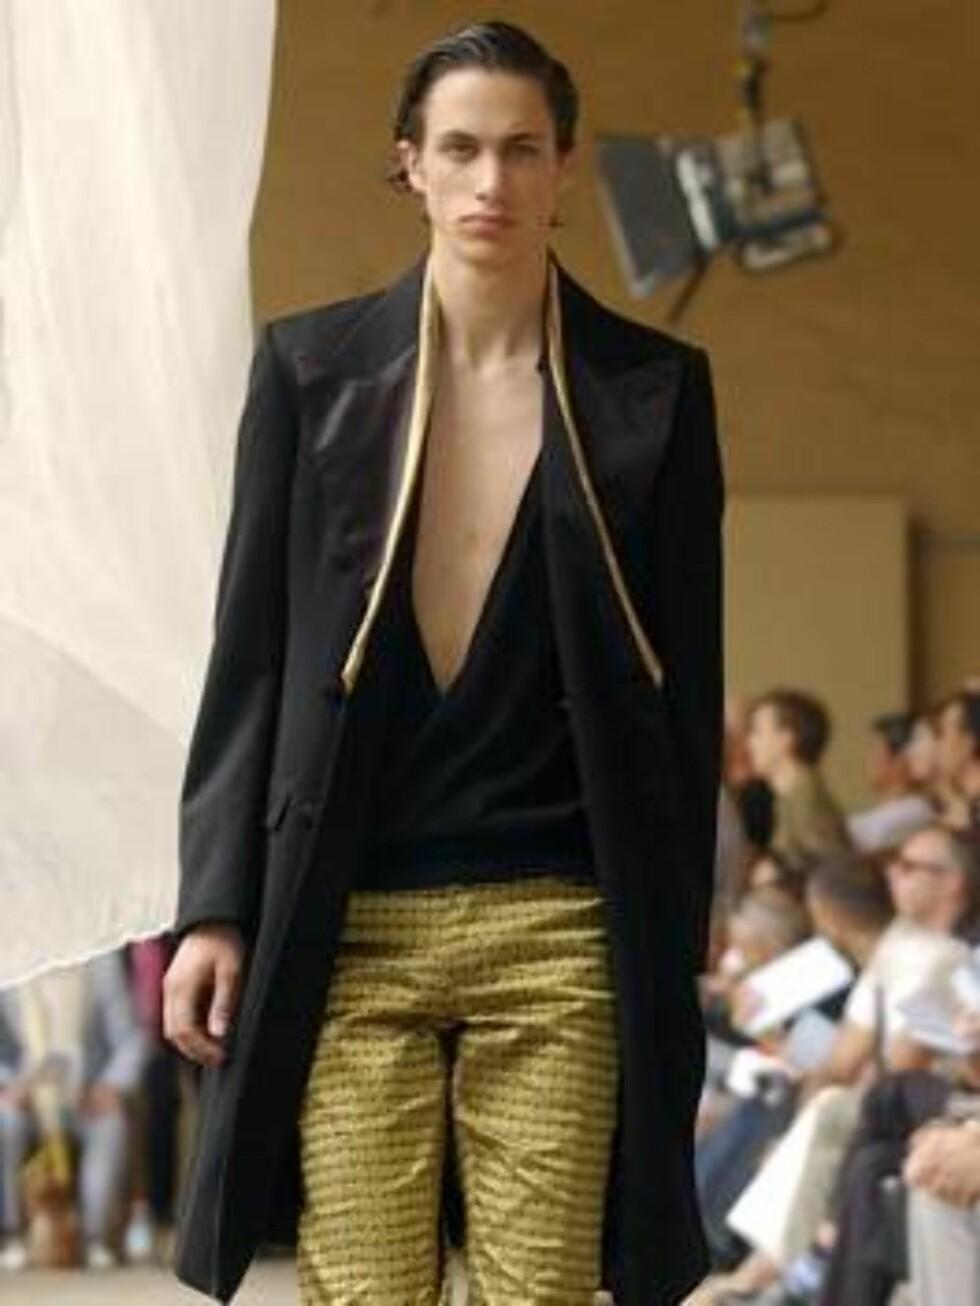 A model wears an outfit part of Alexander McQueen Spring-Summer 2007 men's collection, unveiled in Milan, Italy, Monday, June 26, 2006. (AP Photo/Alberto Pellaschiar) Foto: AP/Scanpix